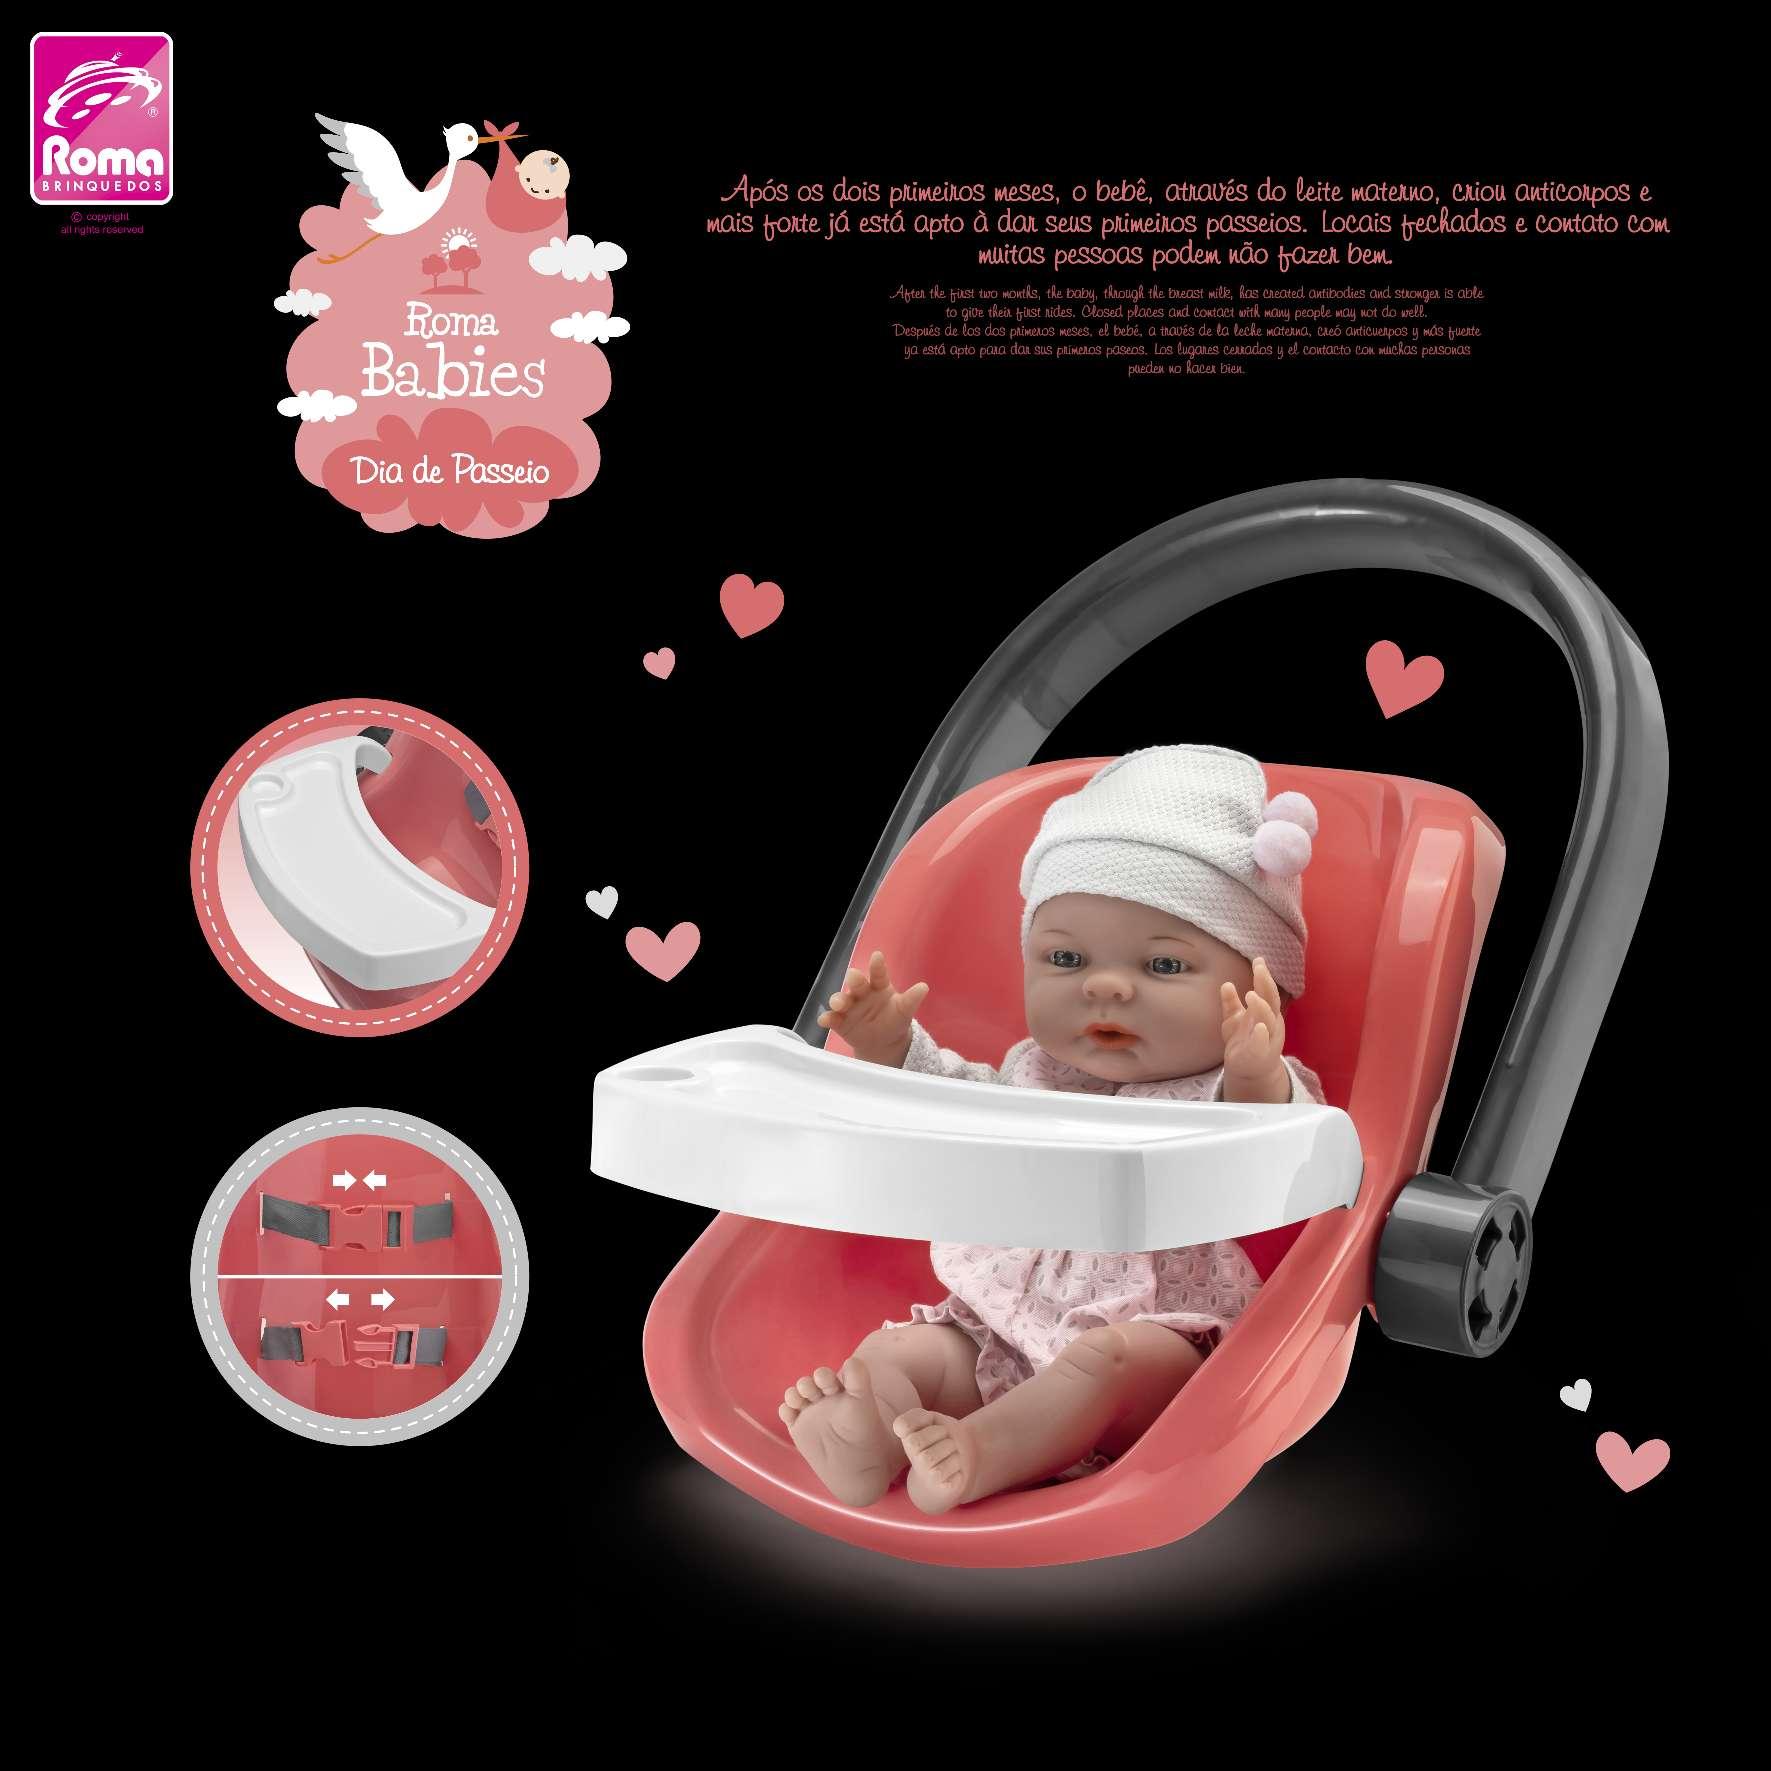 Bebê Conforto C/ Boneca Roma Babies Dia de Passeio - Roma 5044